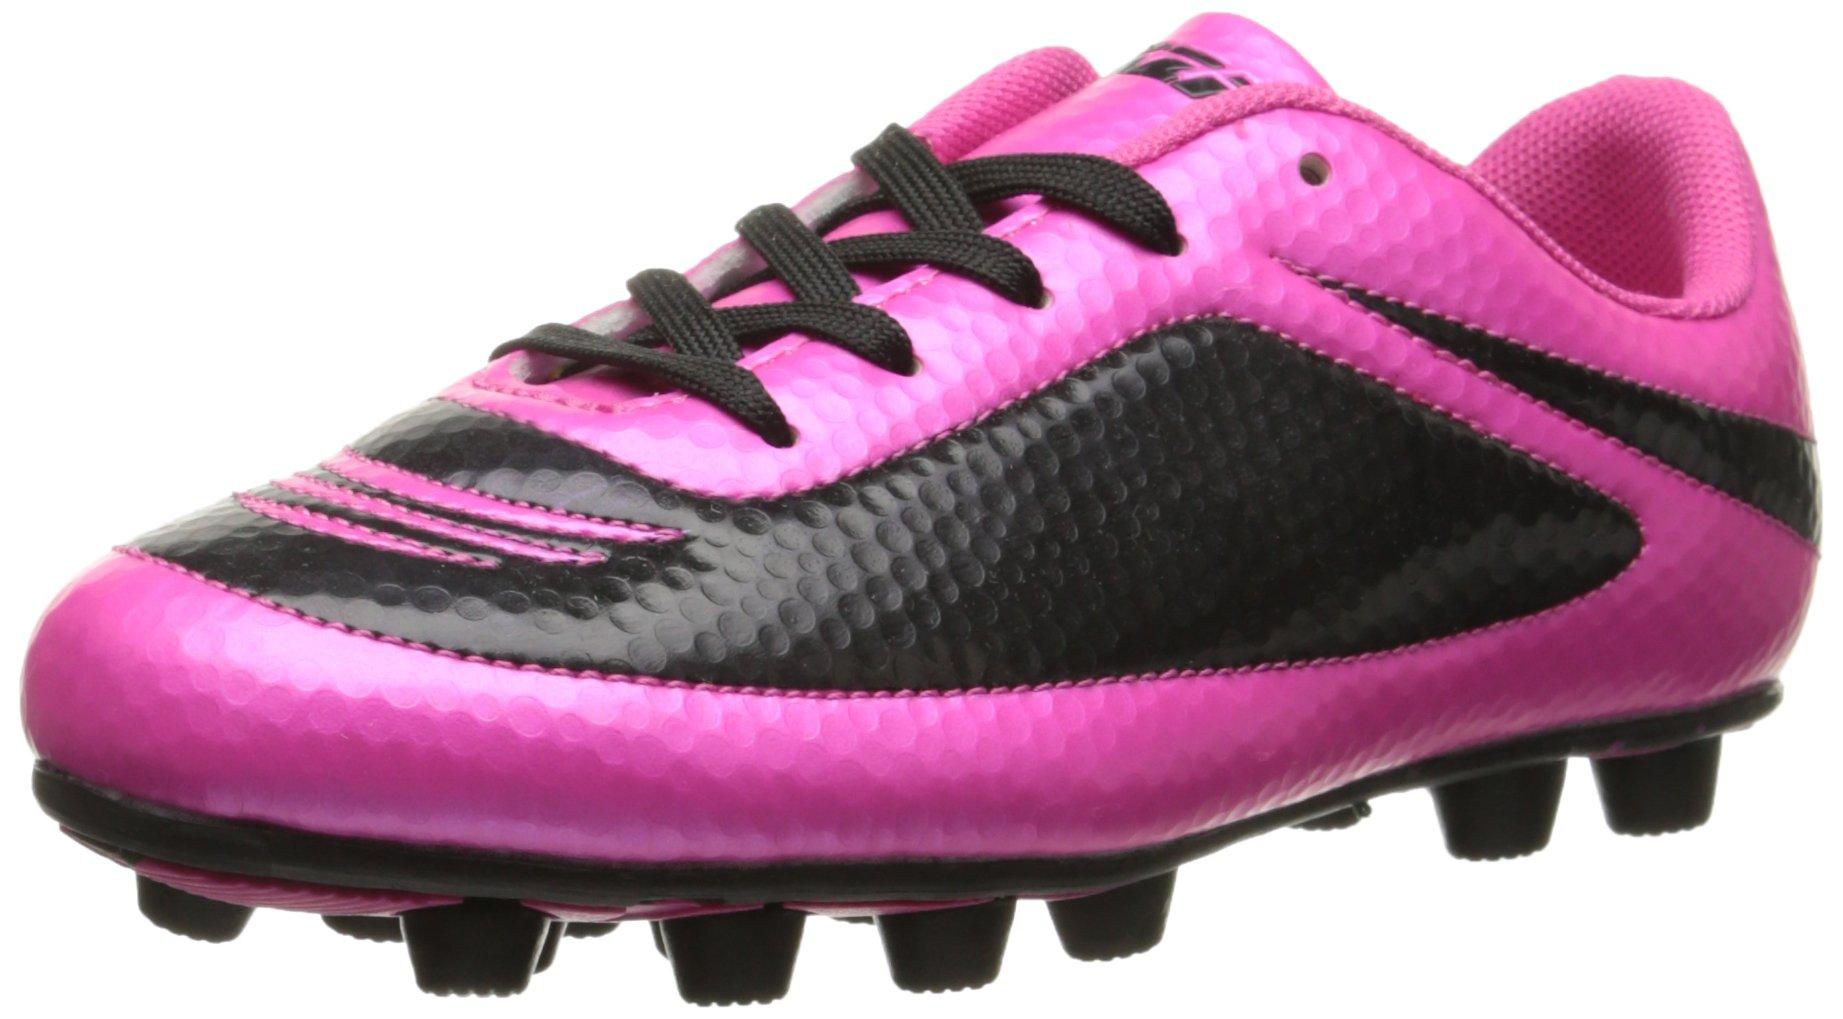 Vizari Infinity FG Soccer Cleat, Pink/Black, 13 M US Little Kid